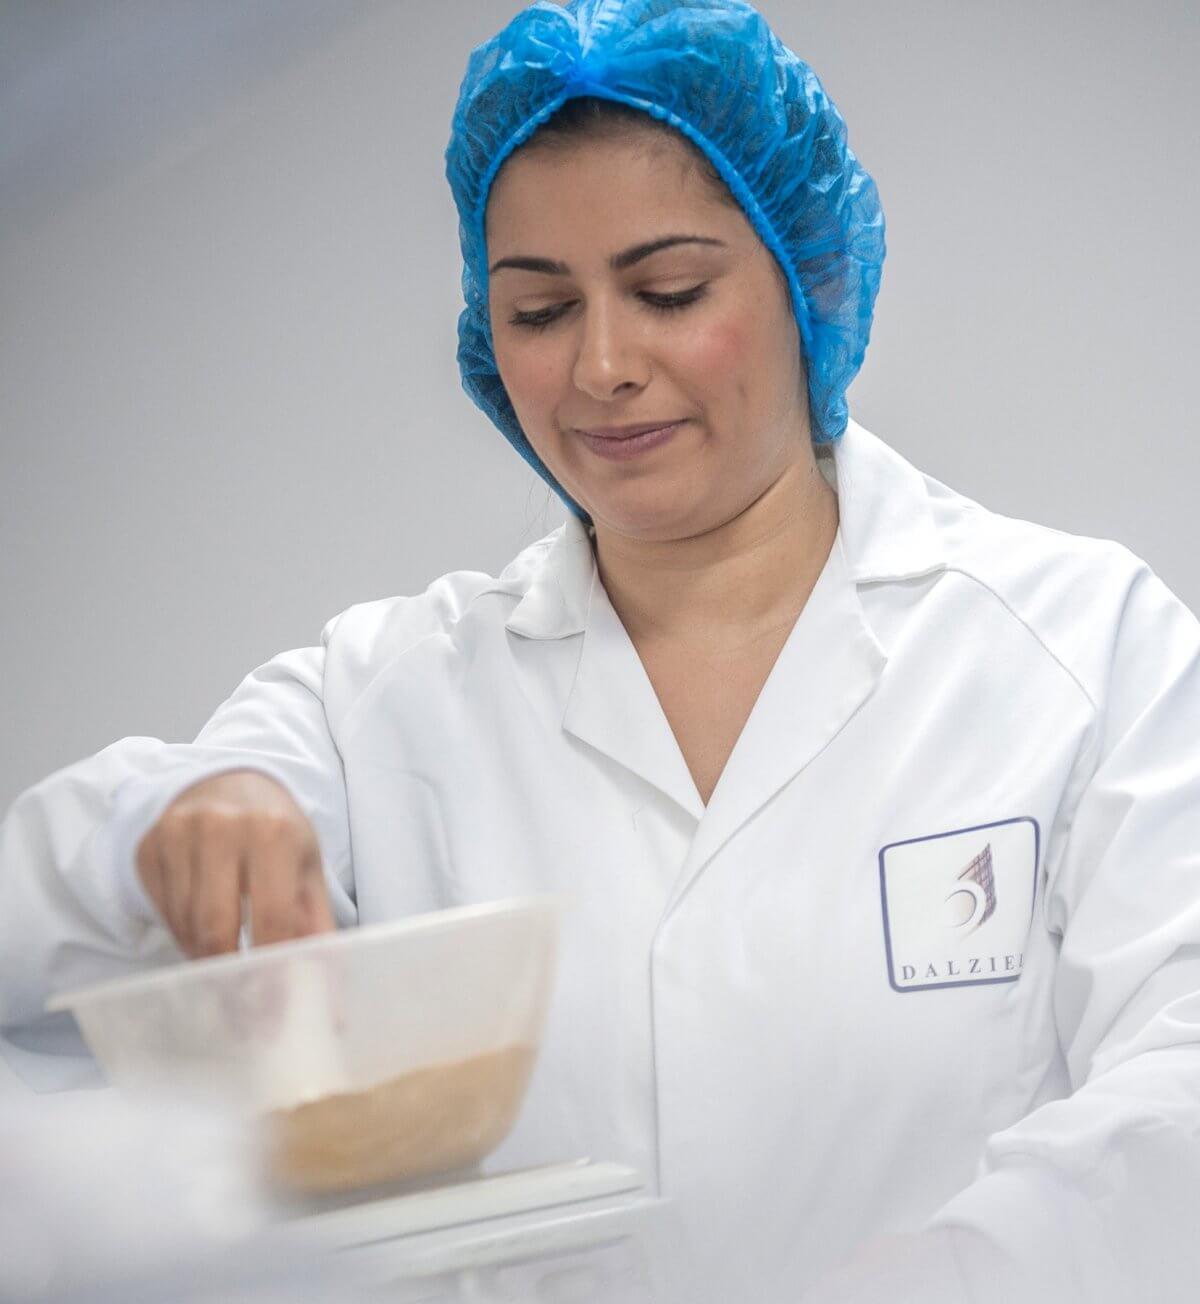 Dalziel Ingredients gluten-free sales growth drives £2.5m expansion